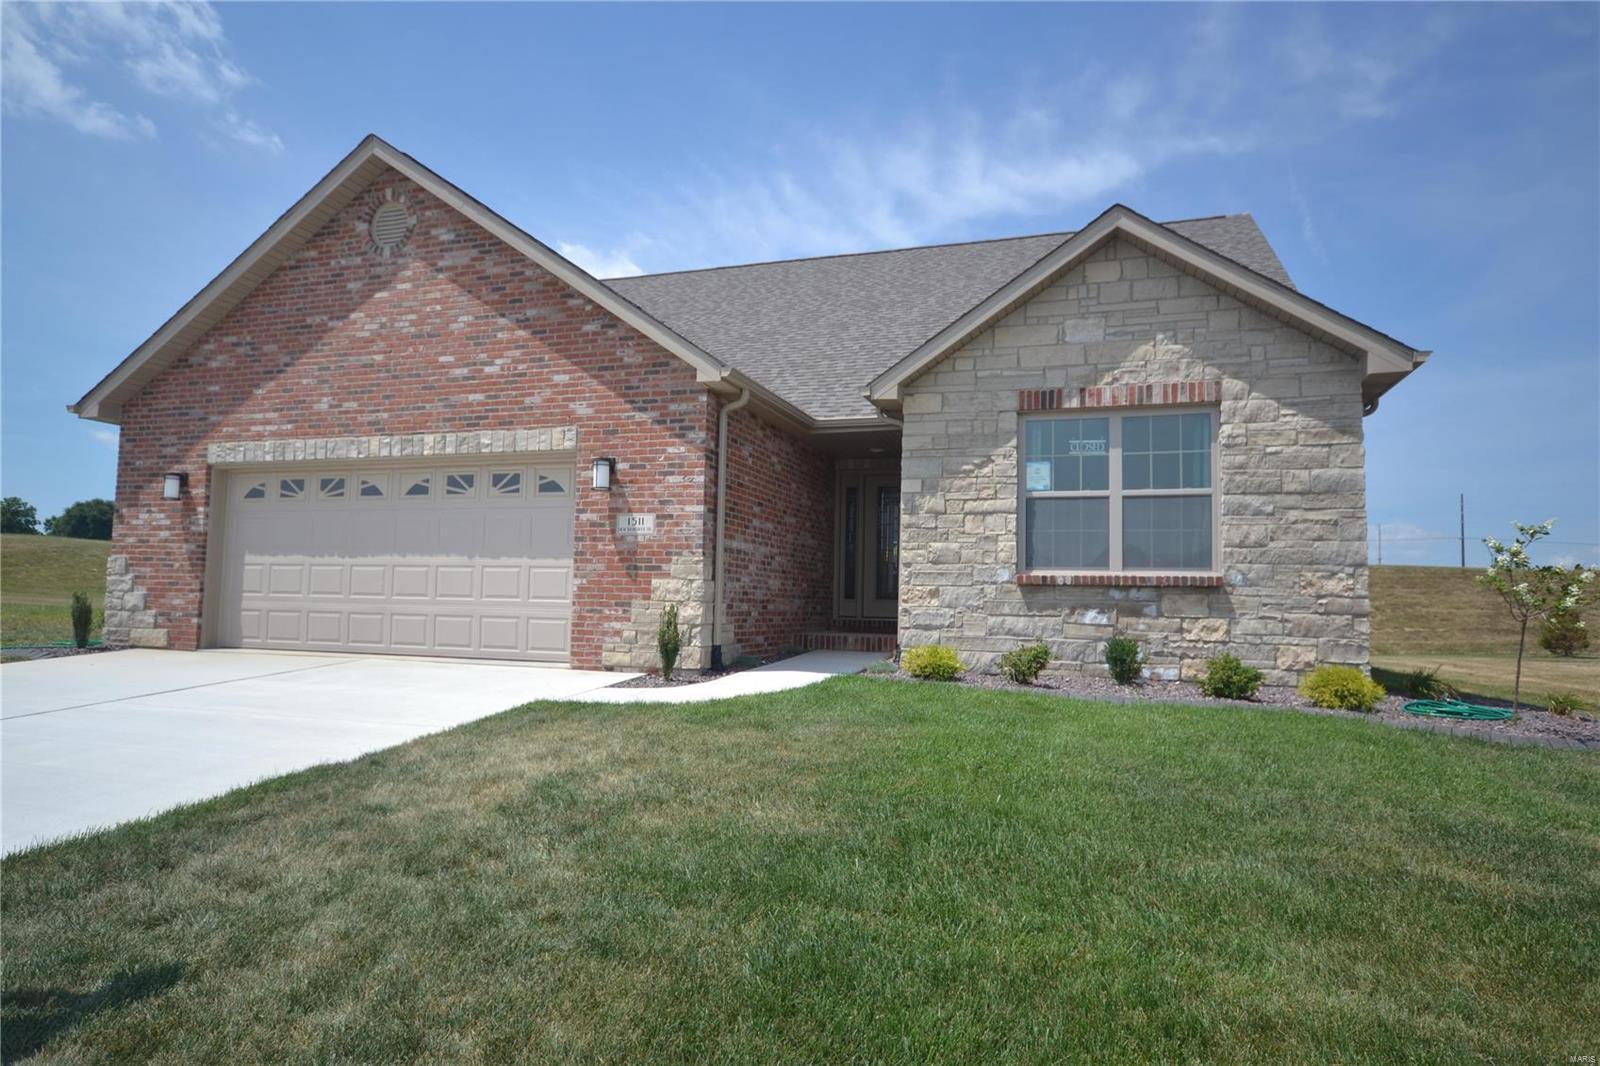 4409 TBB Devin Drive Property Photo - Smithton, IL real estate listing